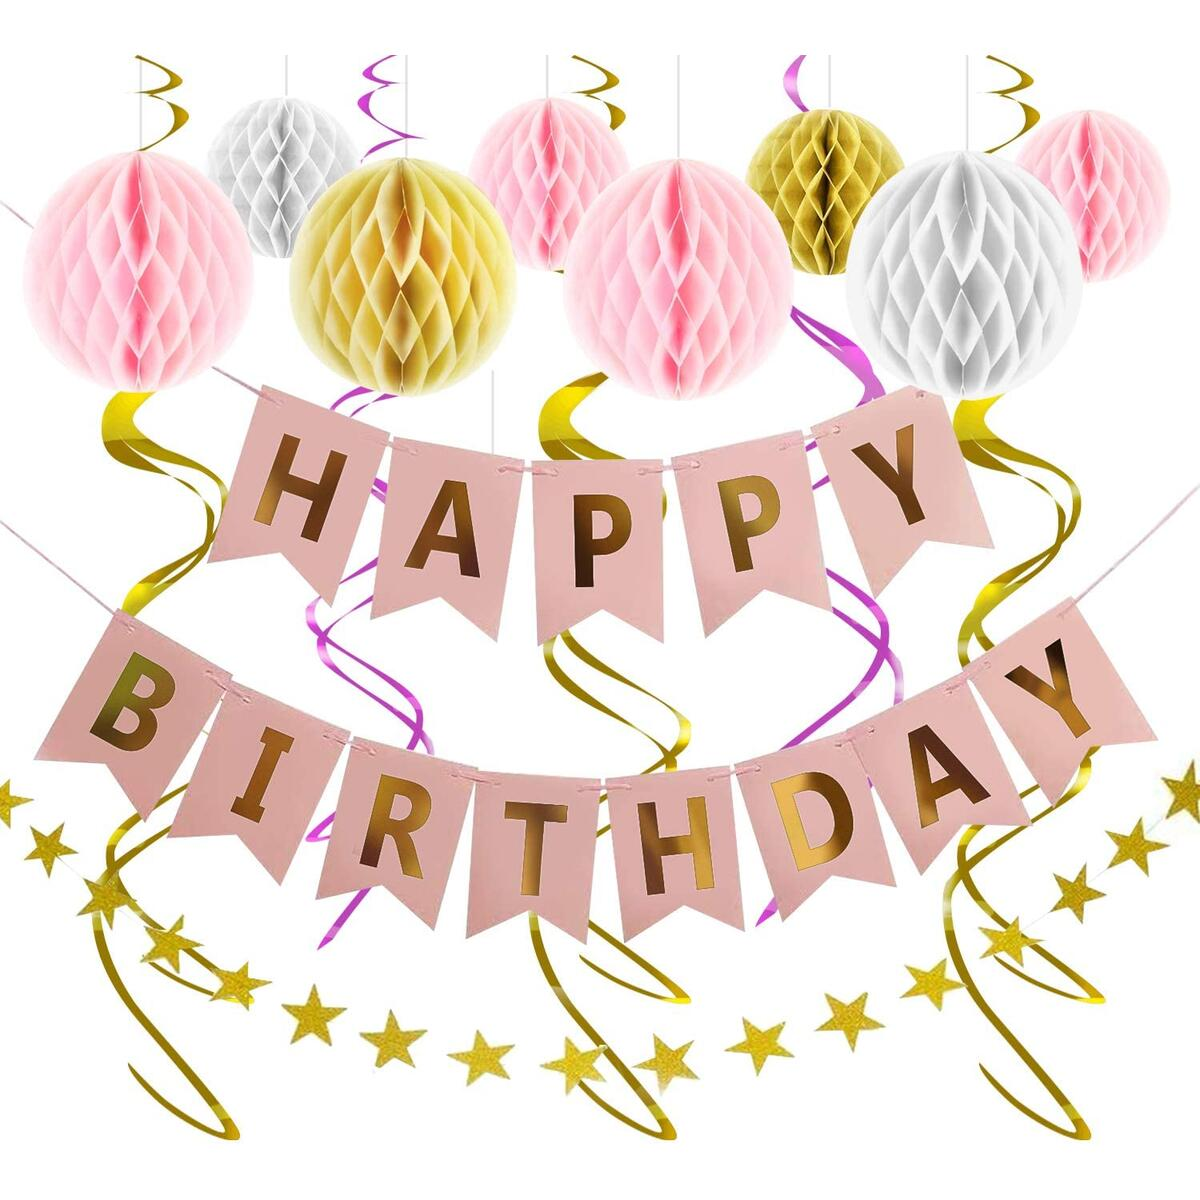 Happy Birthday Banner Party Decorations - Rose Gold Decor Supplies Kit for Girls Boys - Bday Banner Garland Swirls Pom Poms Honeycomb Set